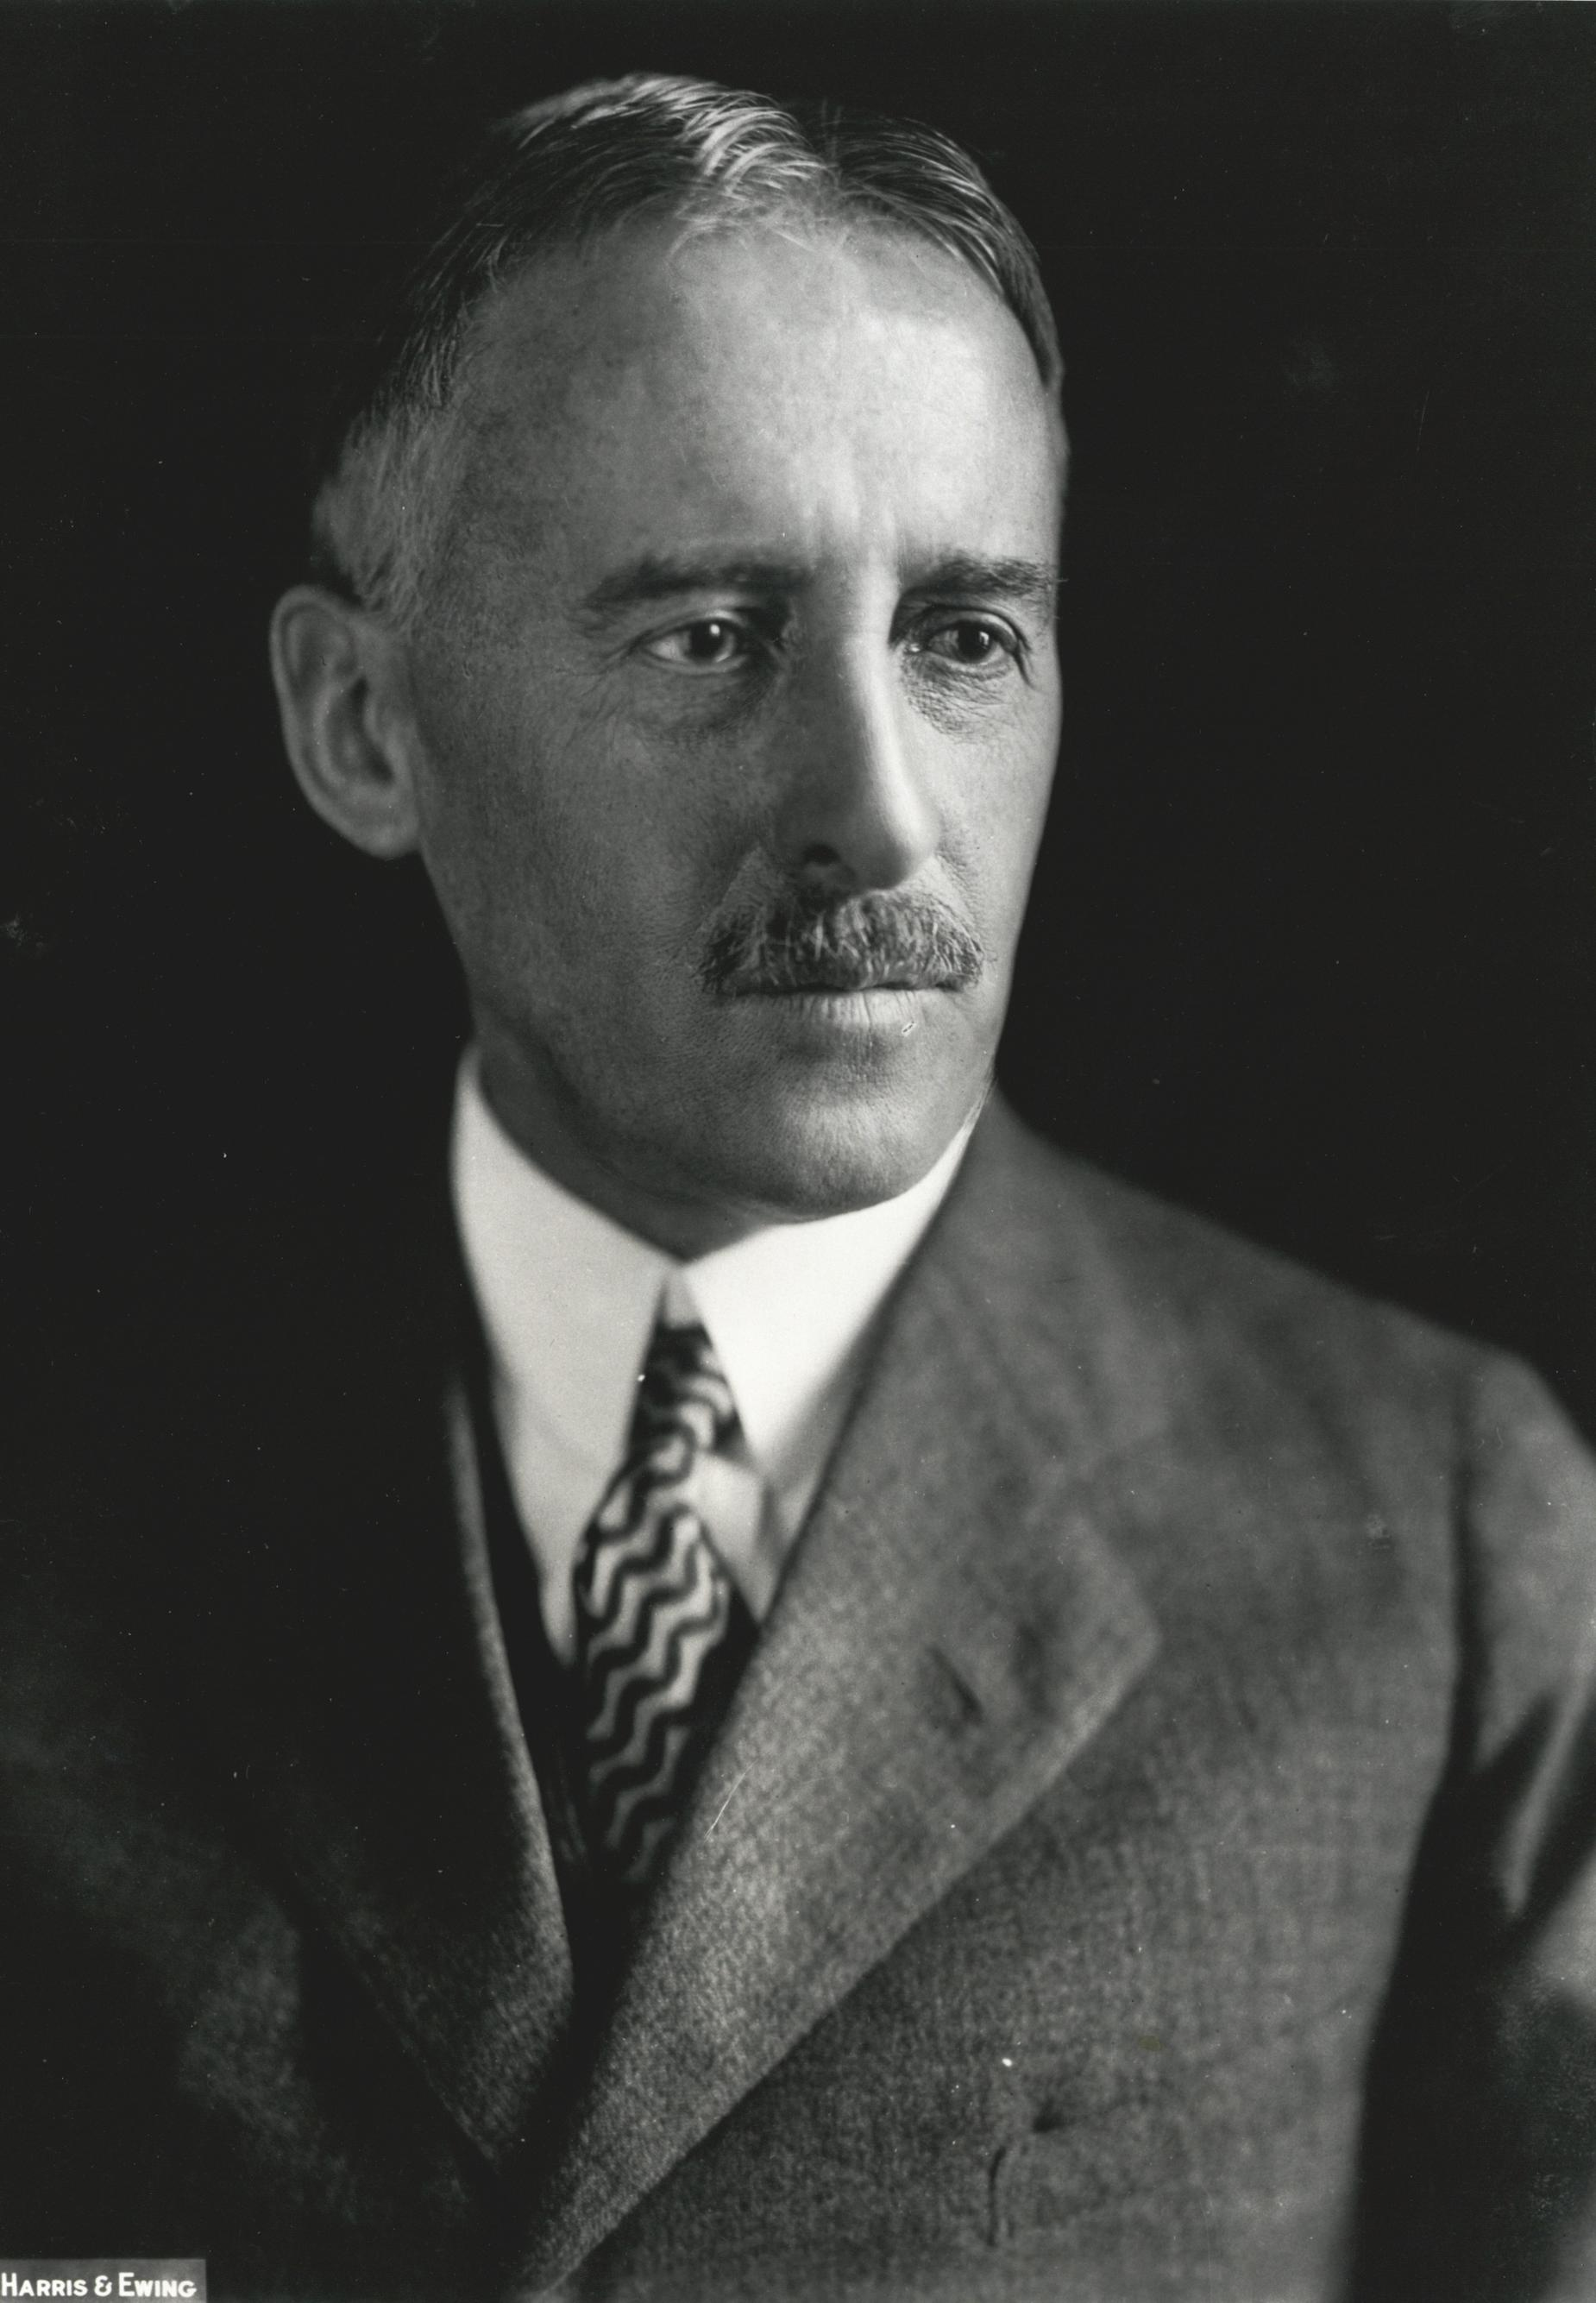 https://upload.wikimedia.org/wikipedia/commons/6/61/Henry_Stimson,_Harris_%26_Ewing_bw_photo_portrait,_1929.jpg